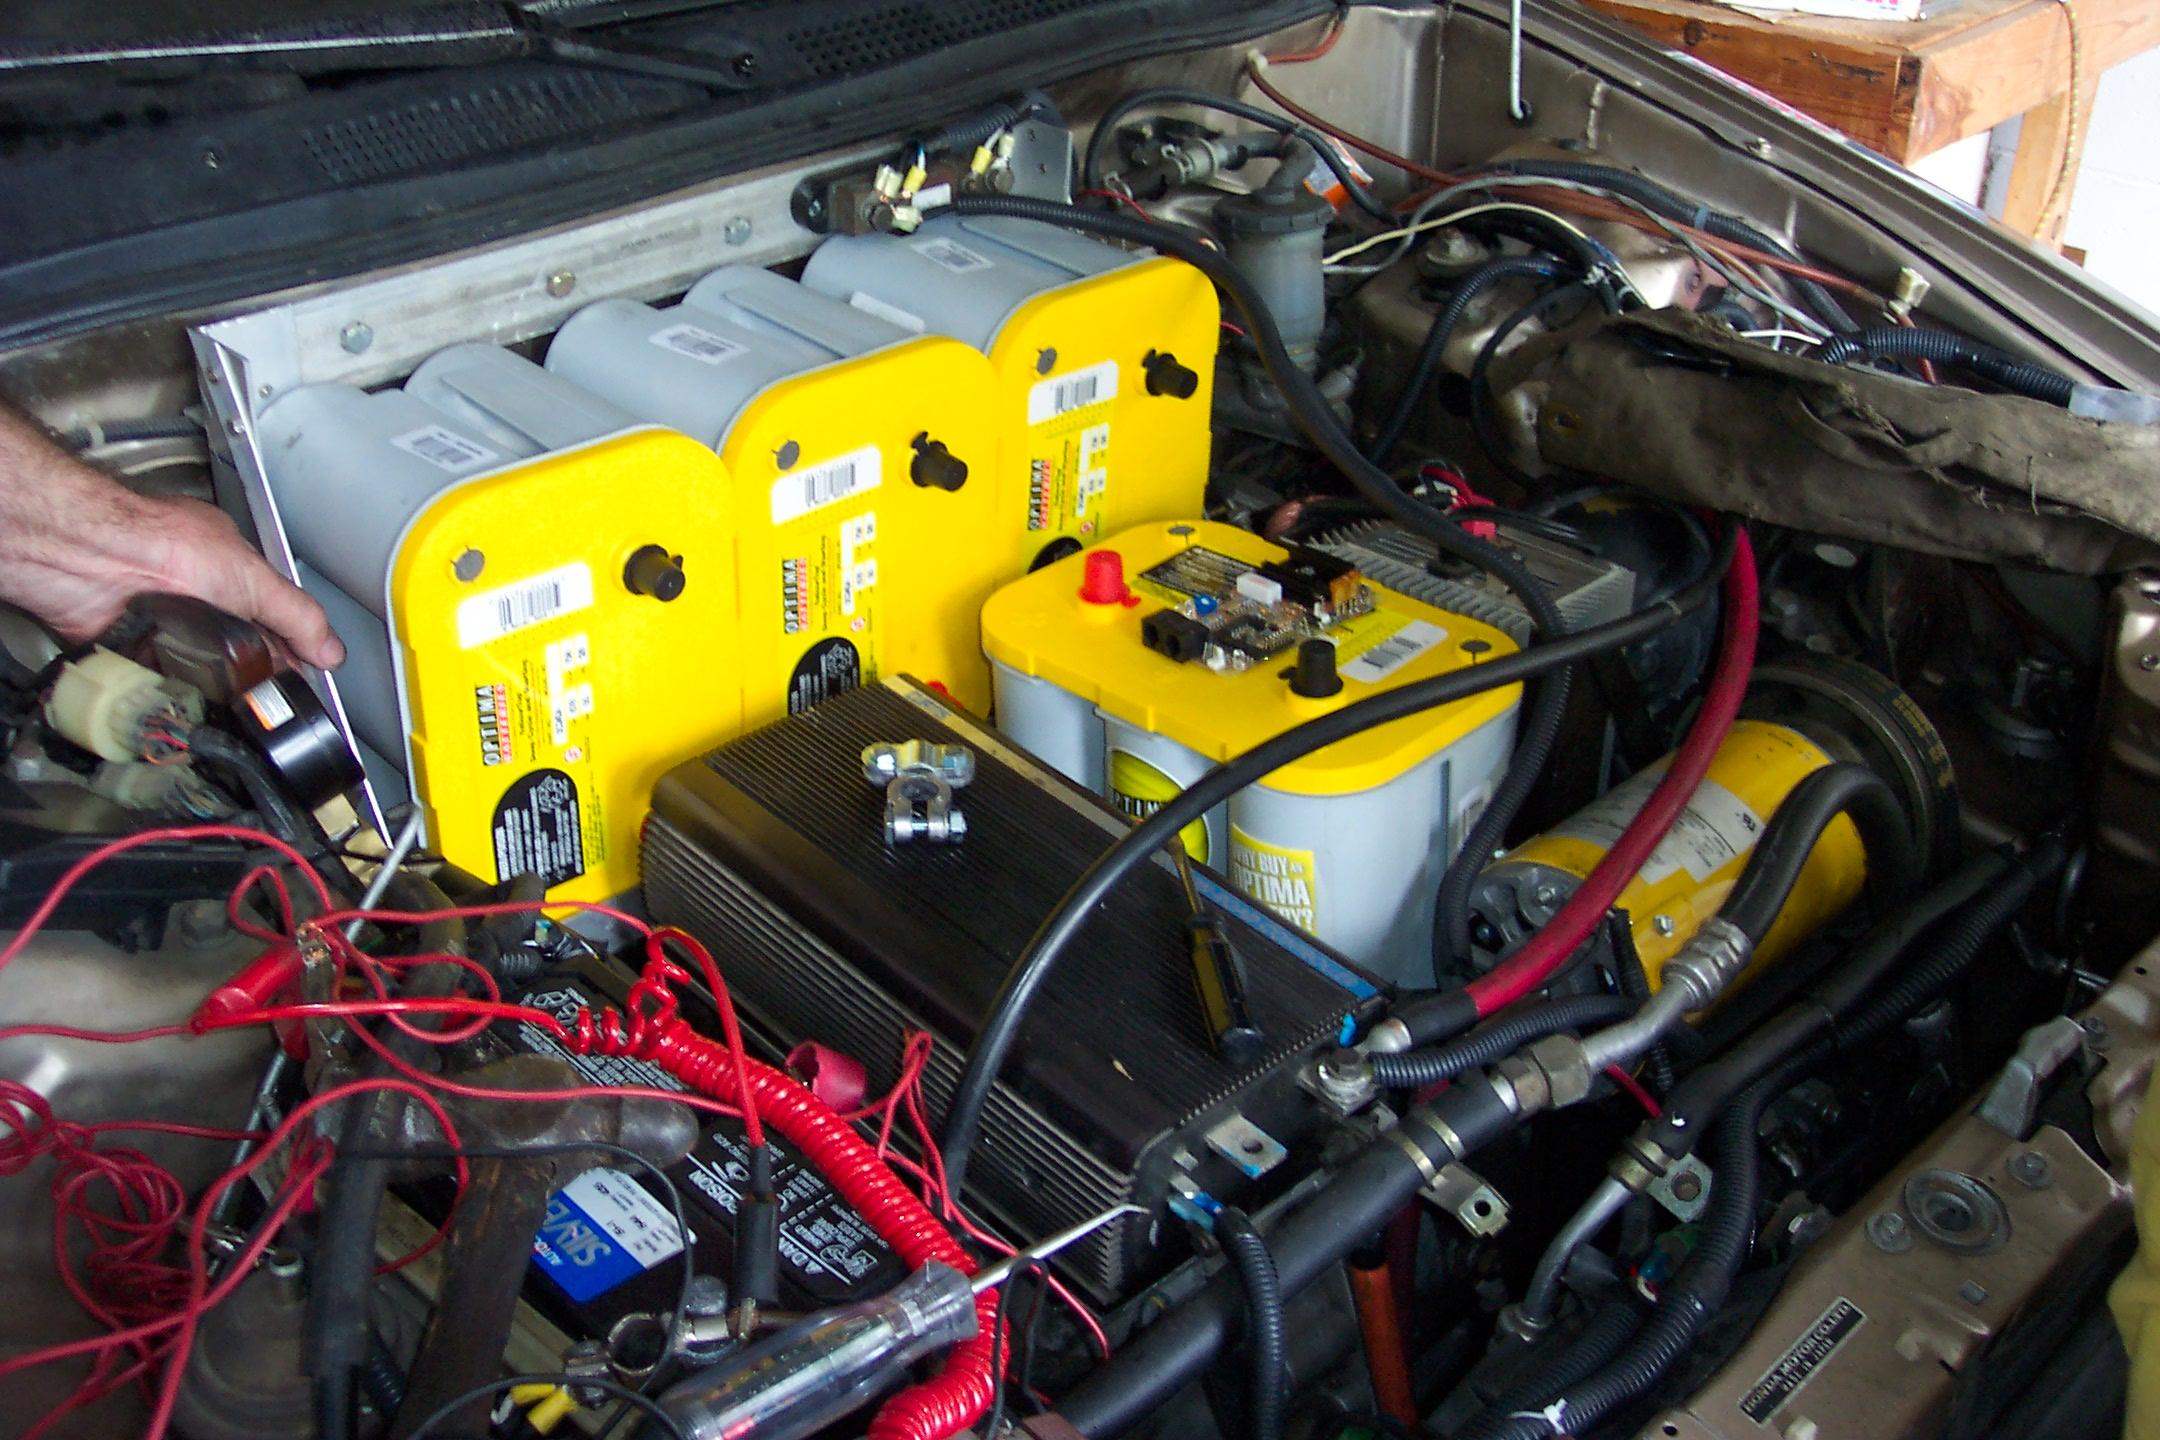 Judeberts Ev Conversion Diary Family Fun Wiring Schematic Dc Car Electrical Diagrams